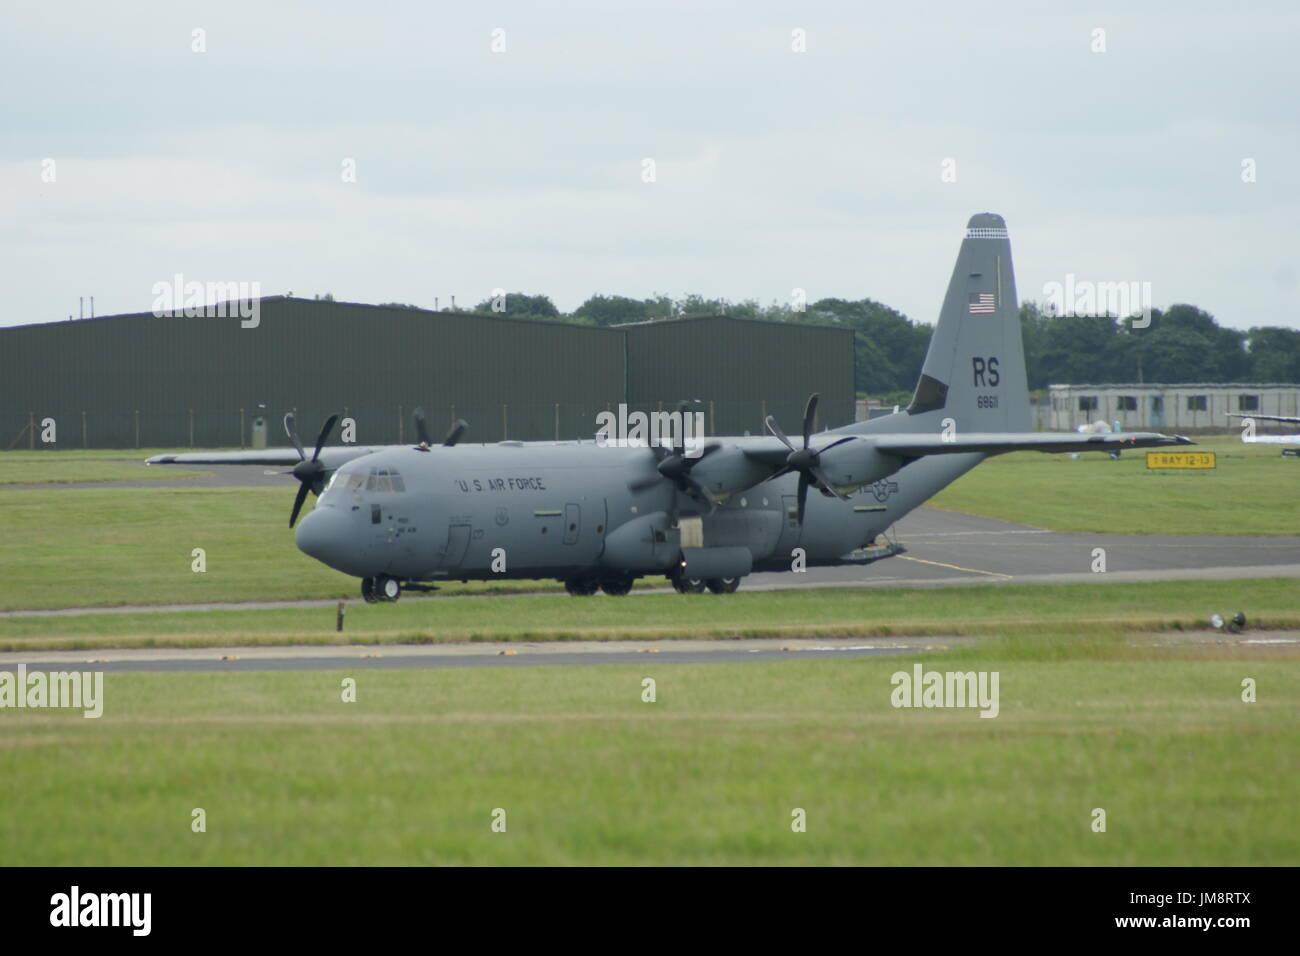 C 130 Military Transport Aircraft Hercules C 130 Stock P...